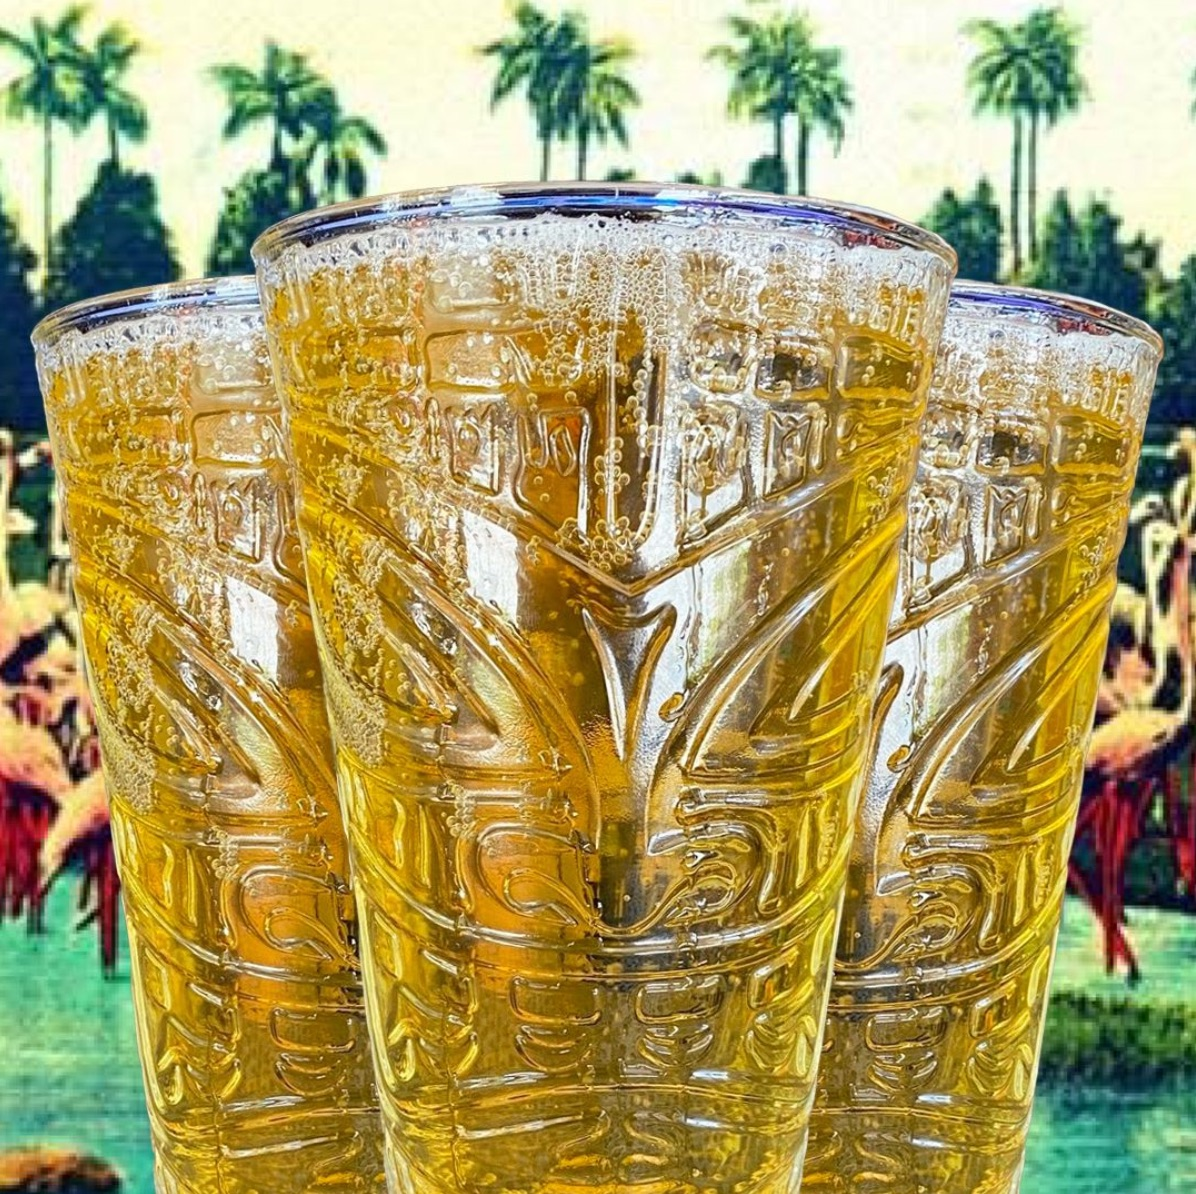 Splitsville Luxury Lanes at Disney Springs is Now Offering Souvenir Tiki Glasses